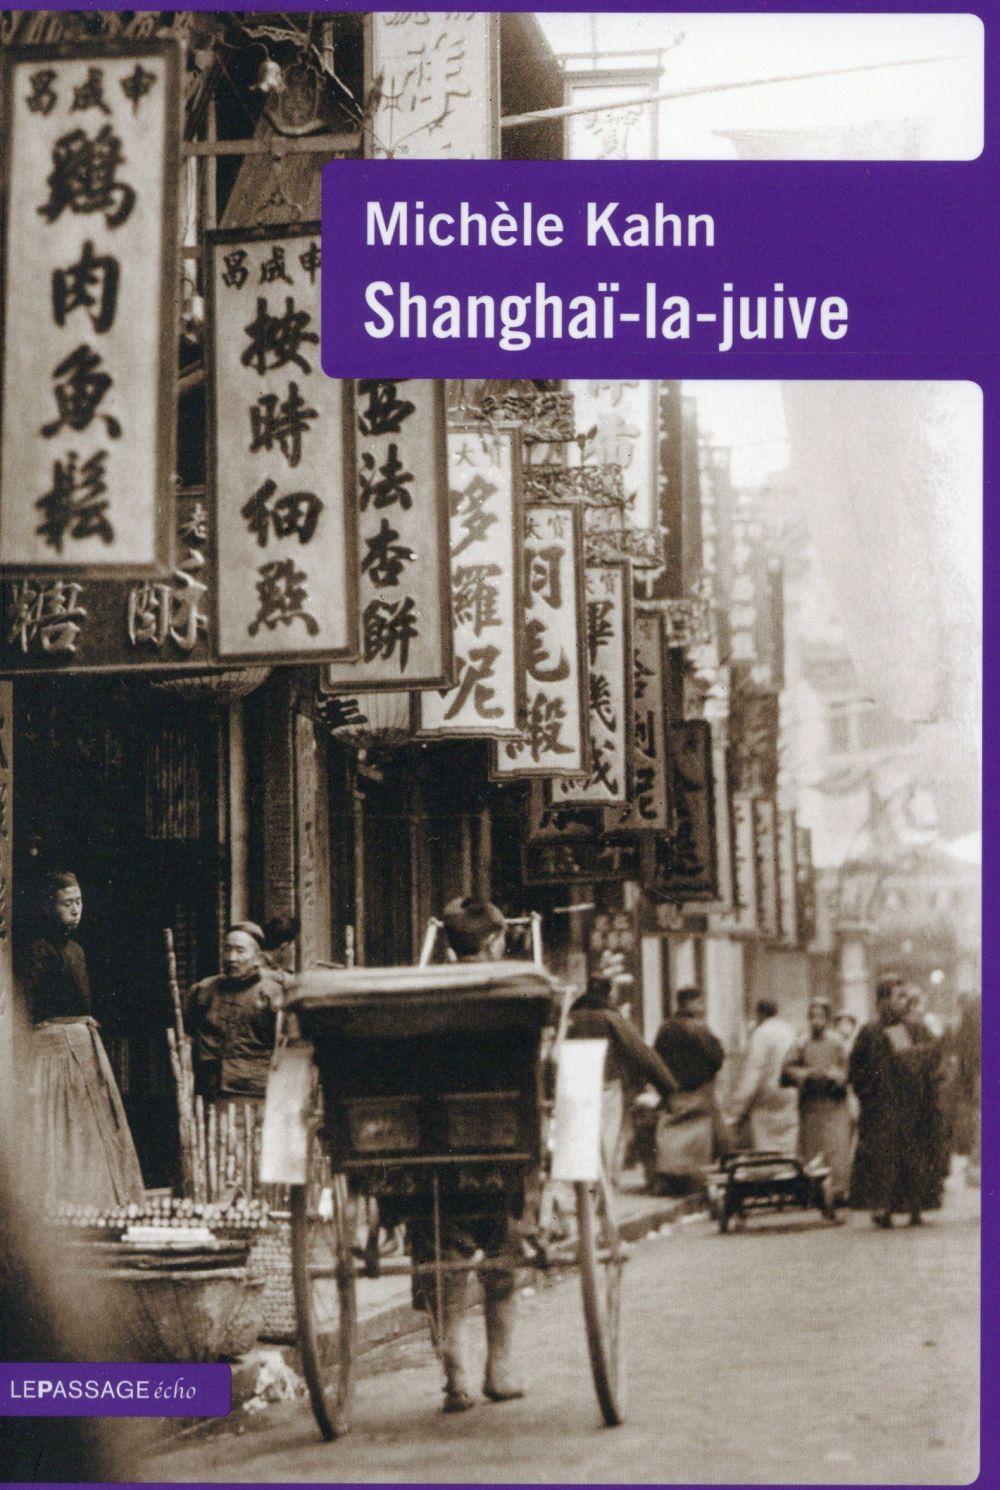 SHANGHAI-LA-JUIVE